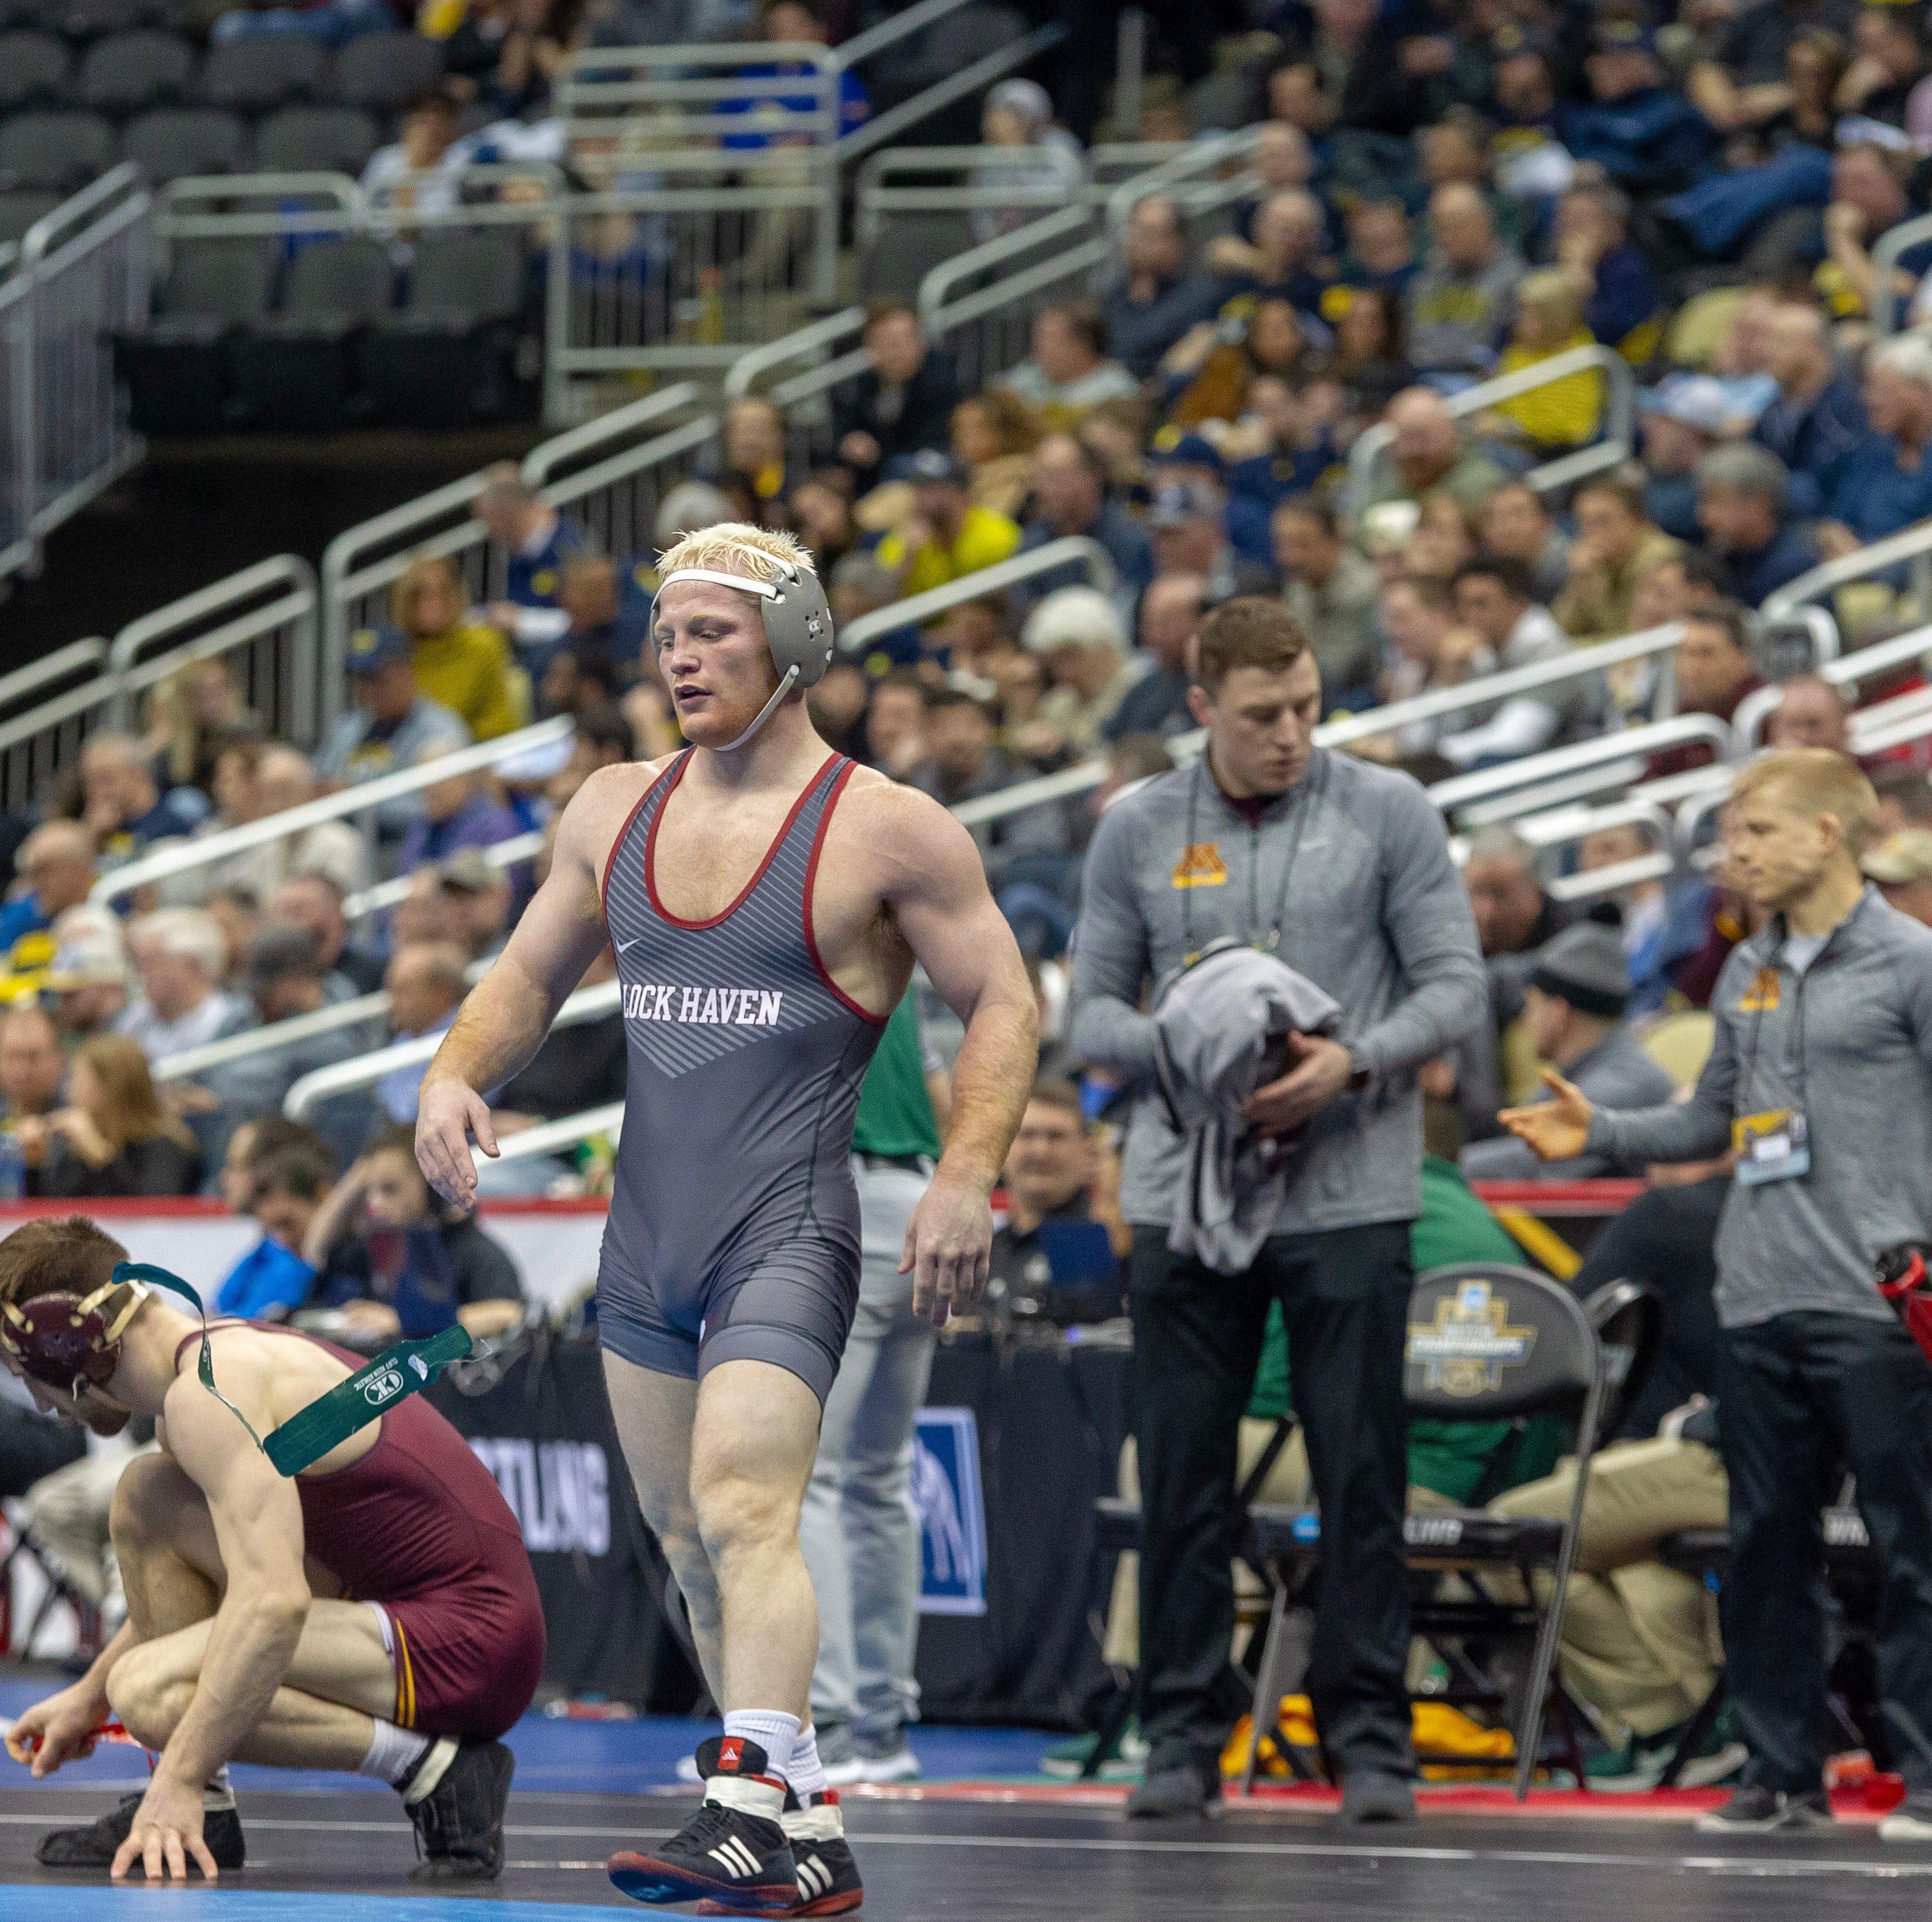 Chance Marsteller falls in NCAA wrestling quarterfinal, has shot at All-America status